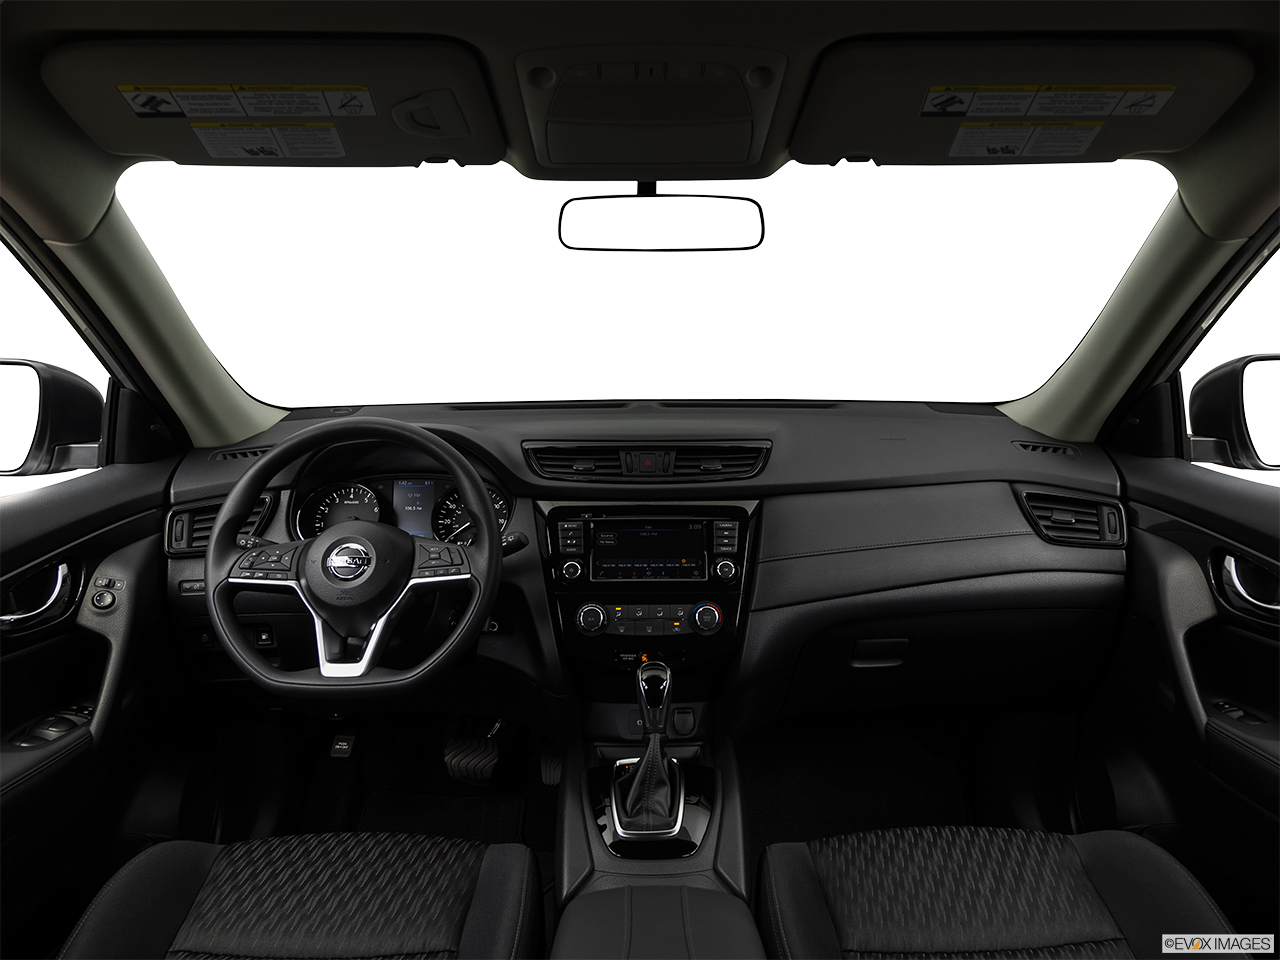 Nissan X-Trail 2018, United Arab Emirates, Centered wide dash shot